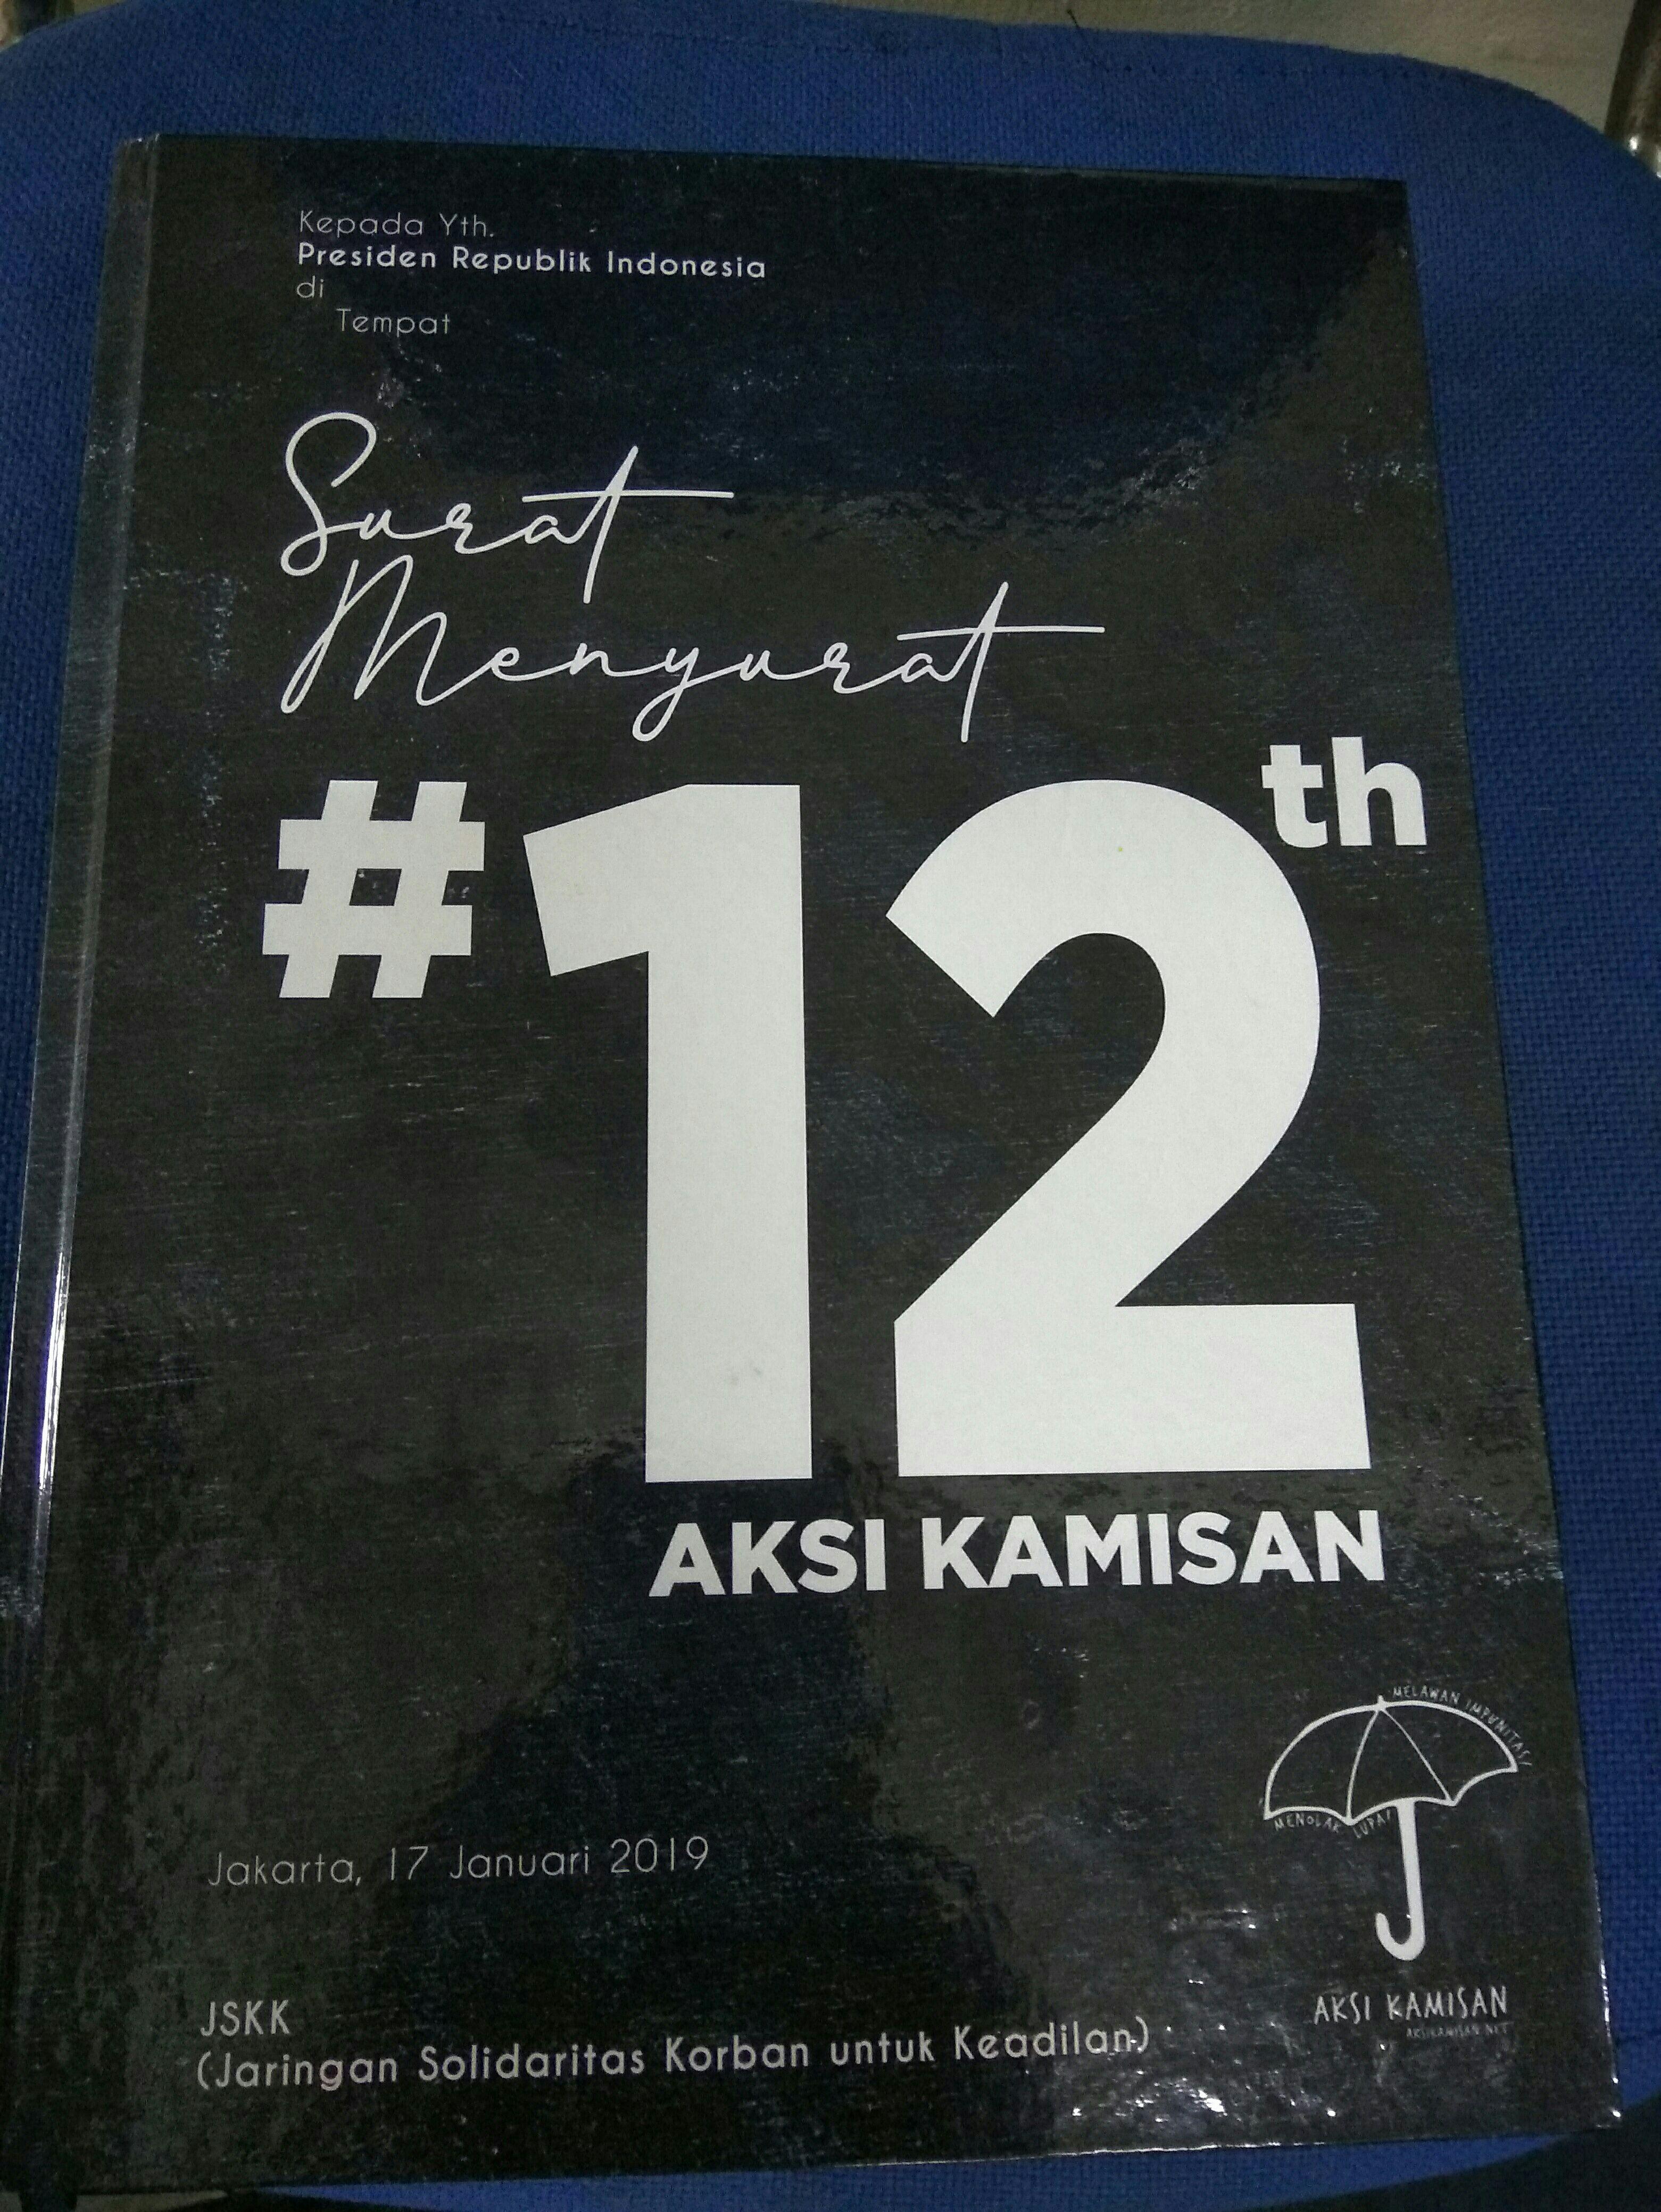 Buku hitam yang merupakan kumpulan surat menyurat selama 12 tahun aksi kamisan di Istana negara (dok. Hatta)